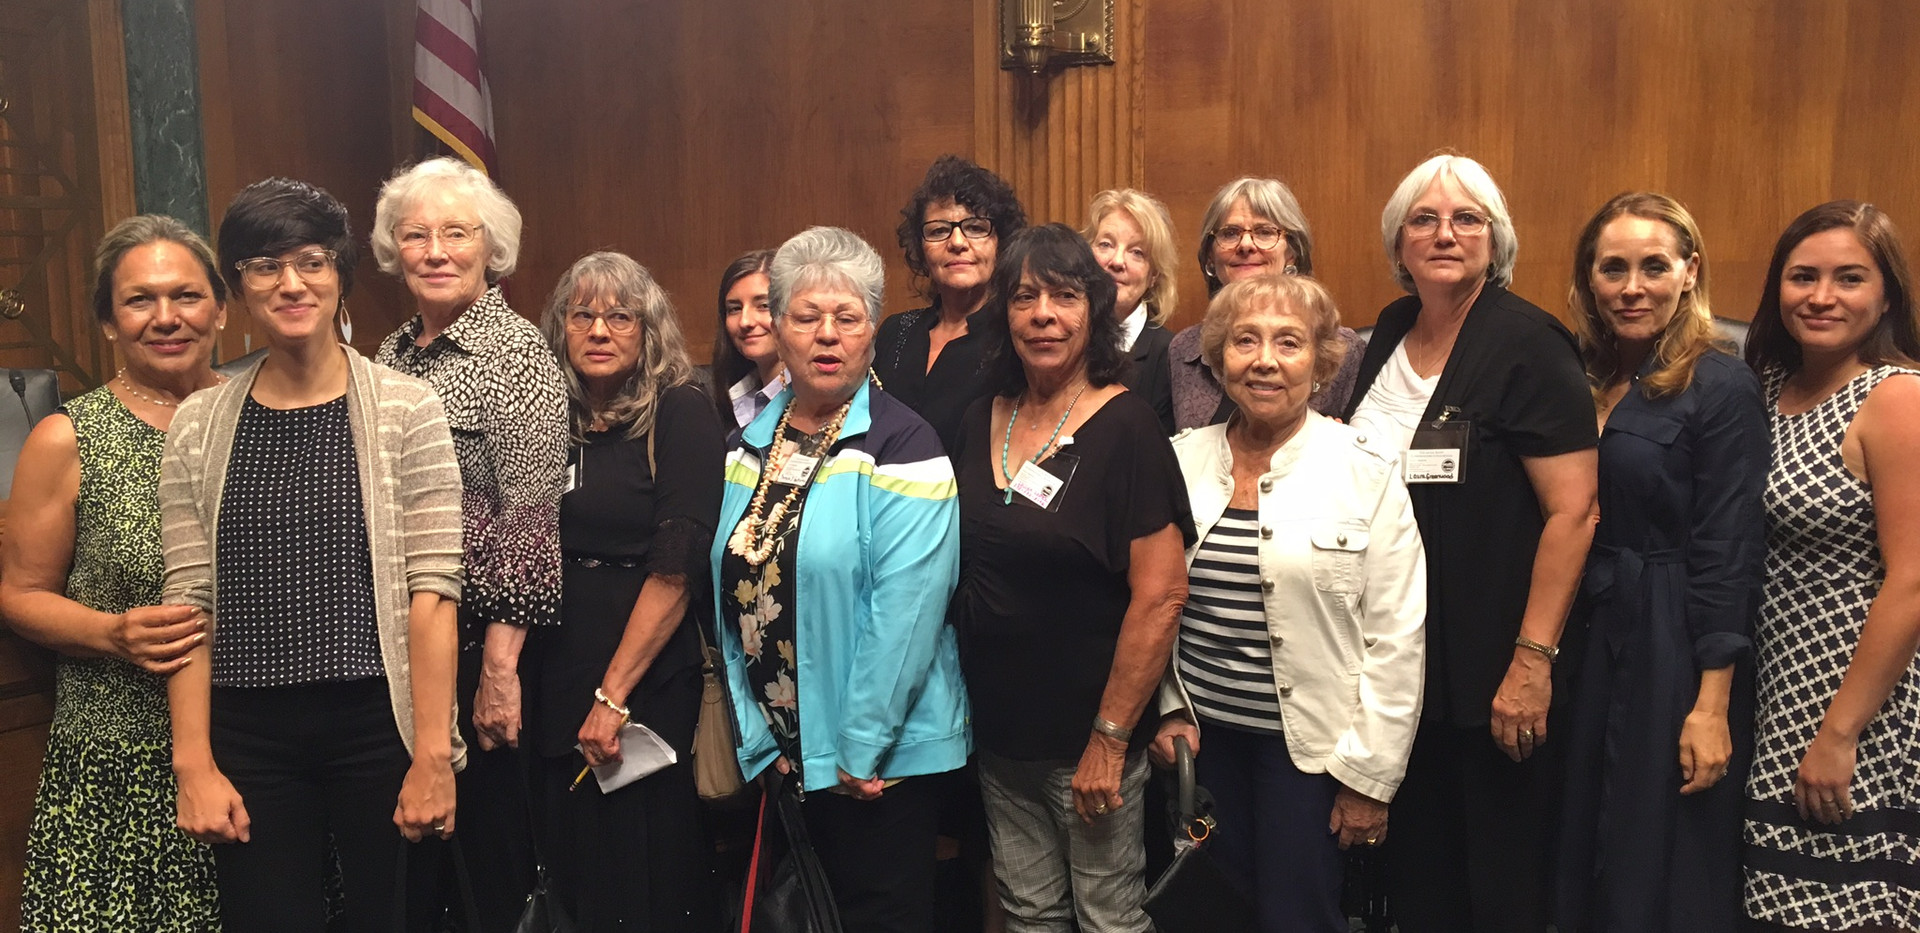 Members of TBDC in the Senate Judiciary Committee Chambers